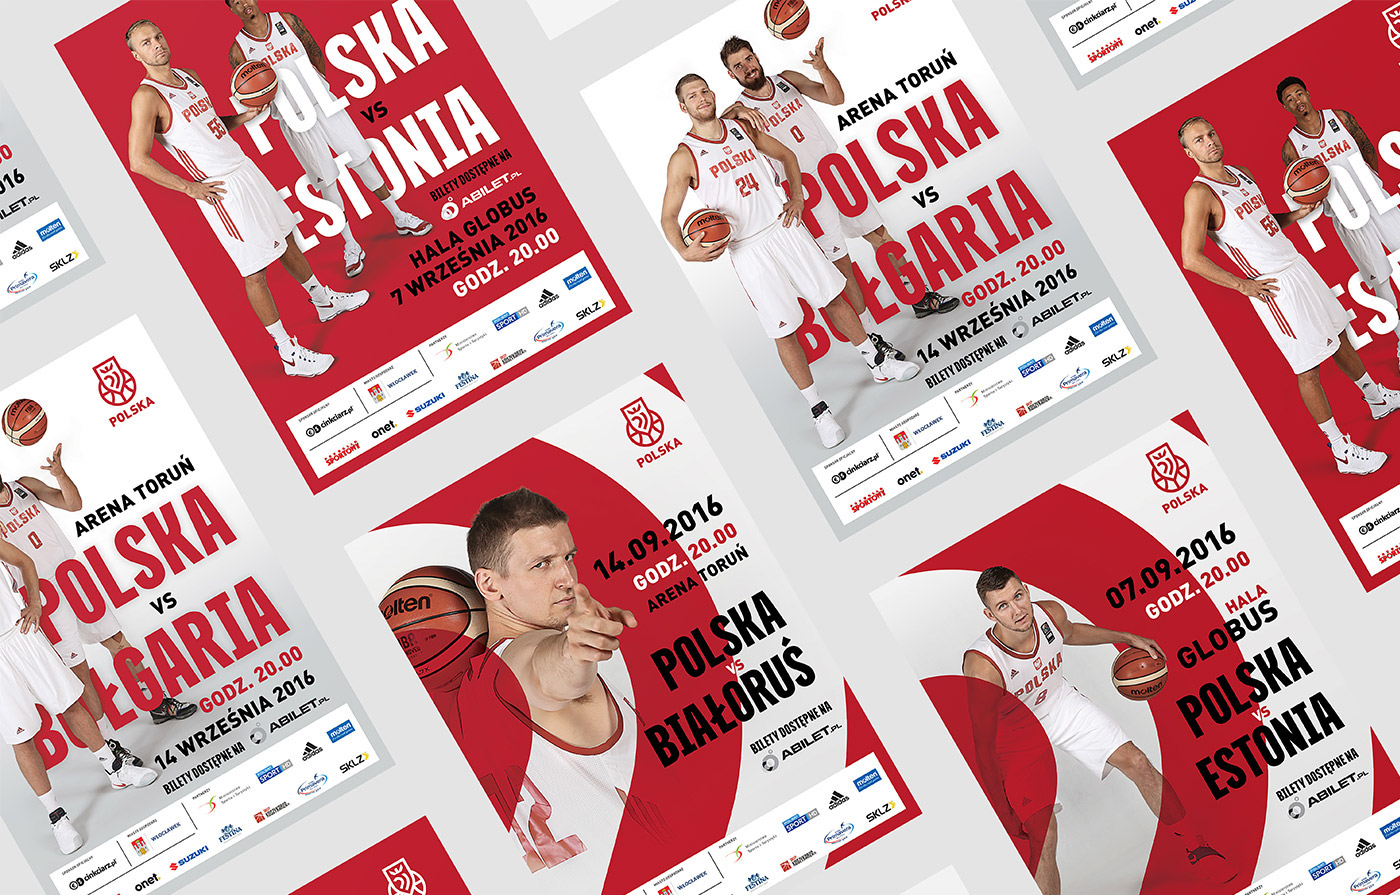 basketball national poland koszkadra